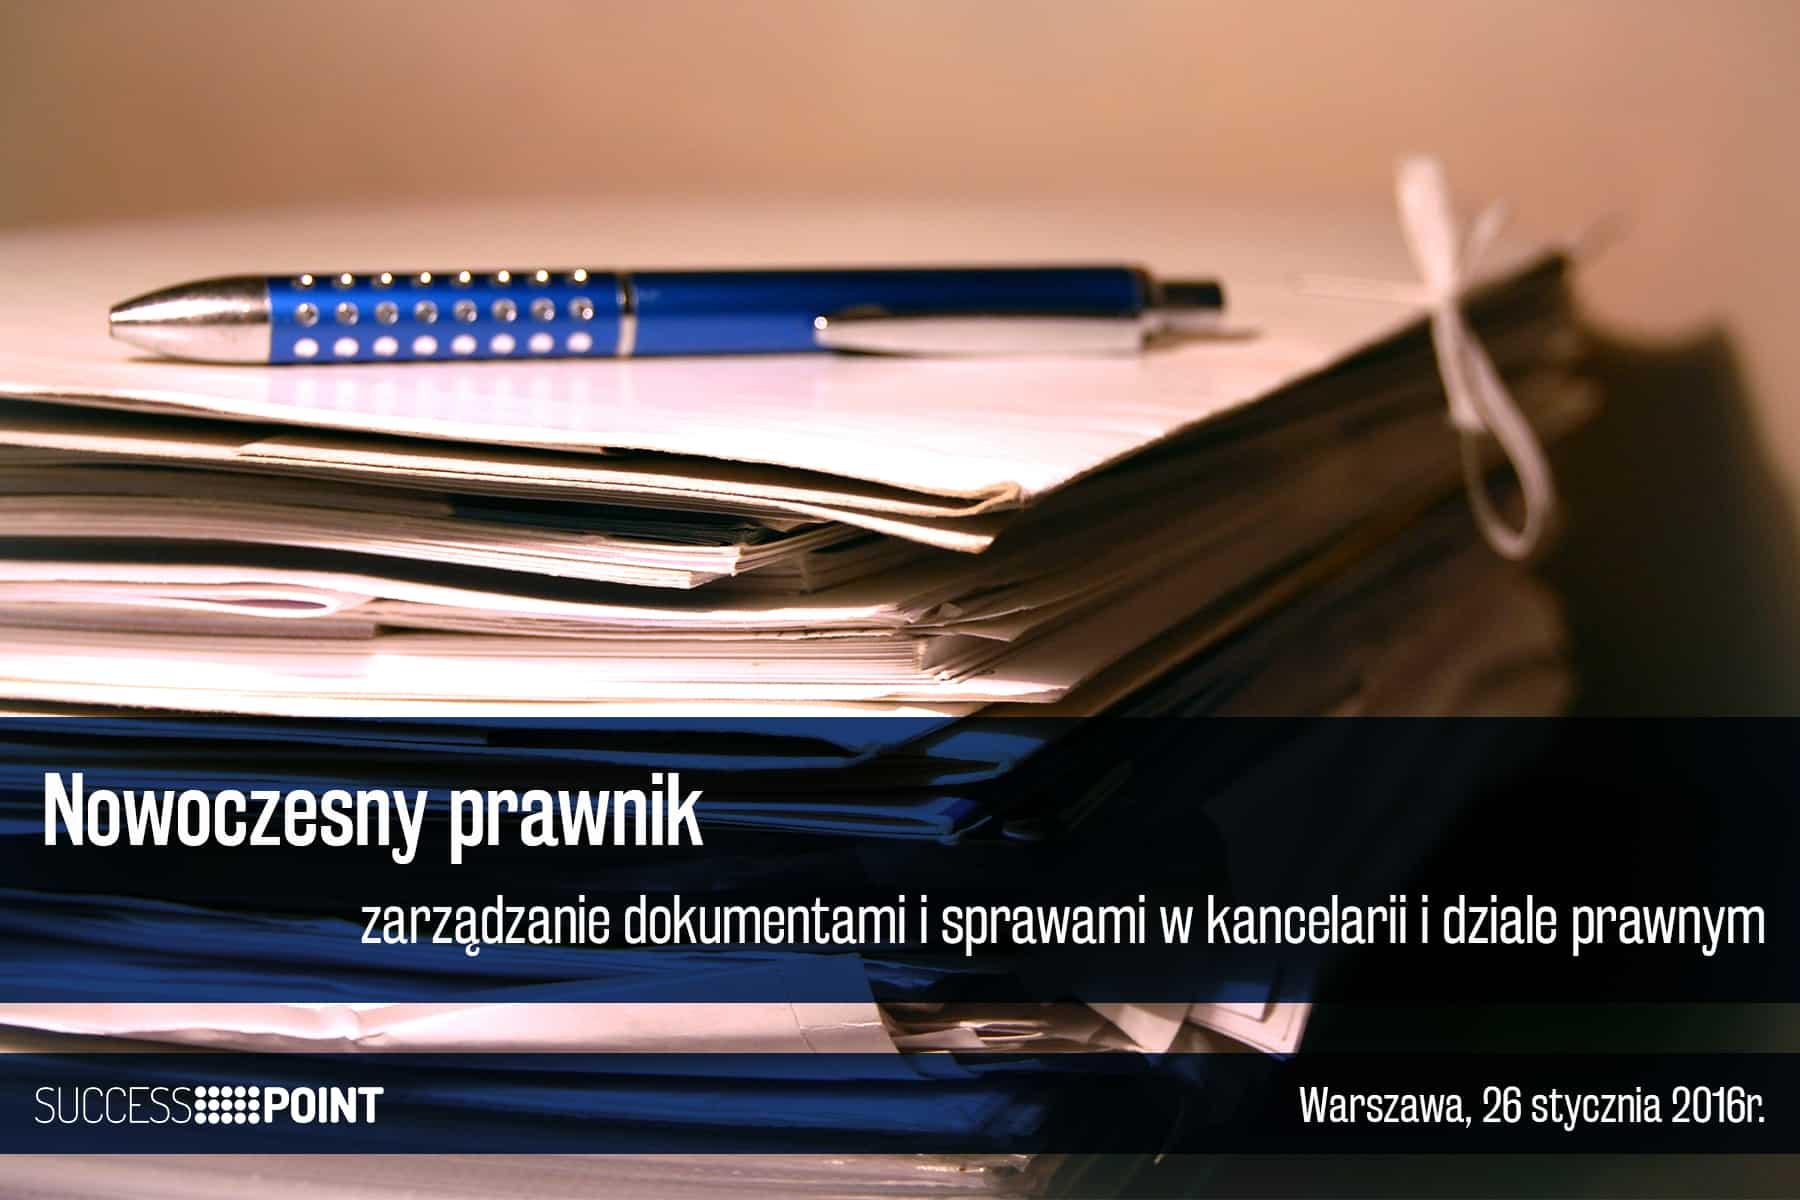 nowoczesny_prawnik_1800x1200_v2